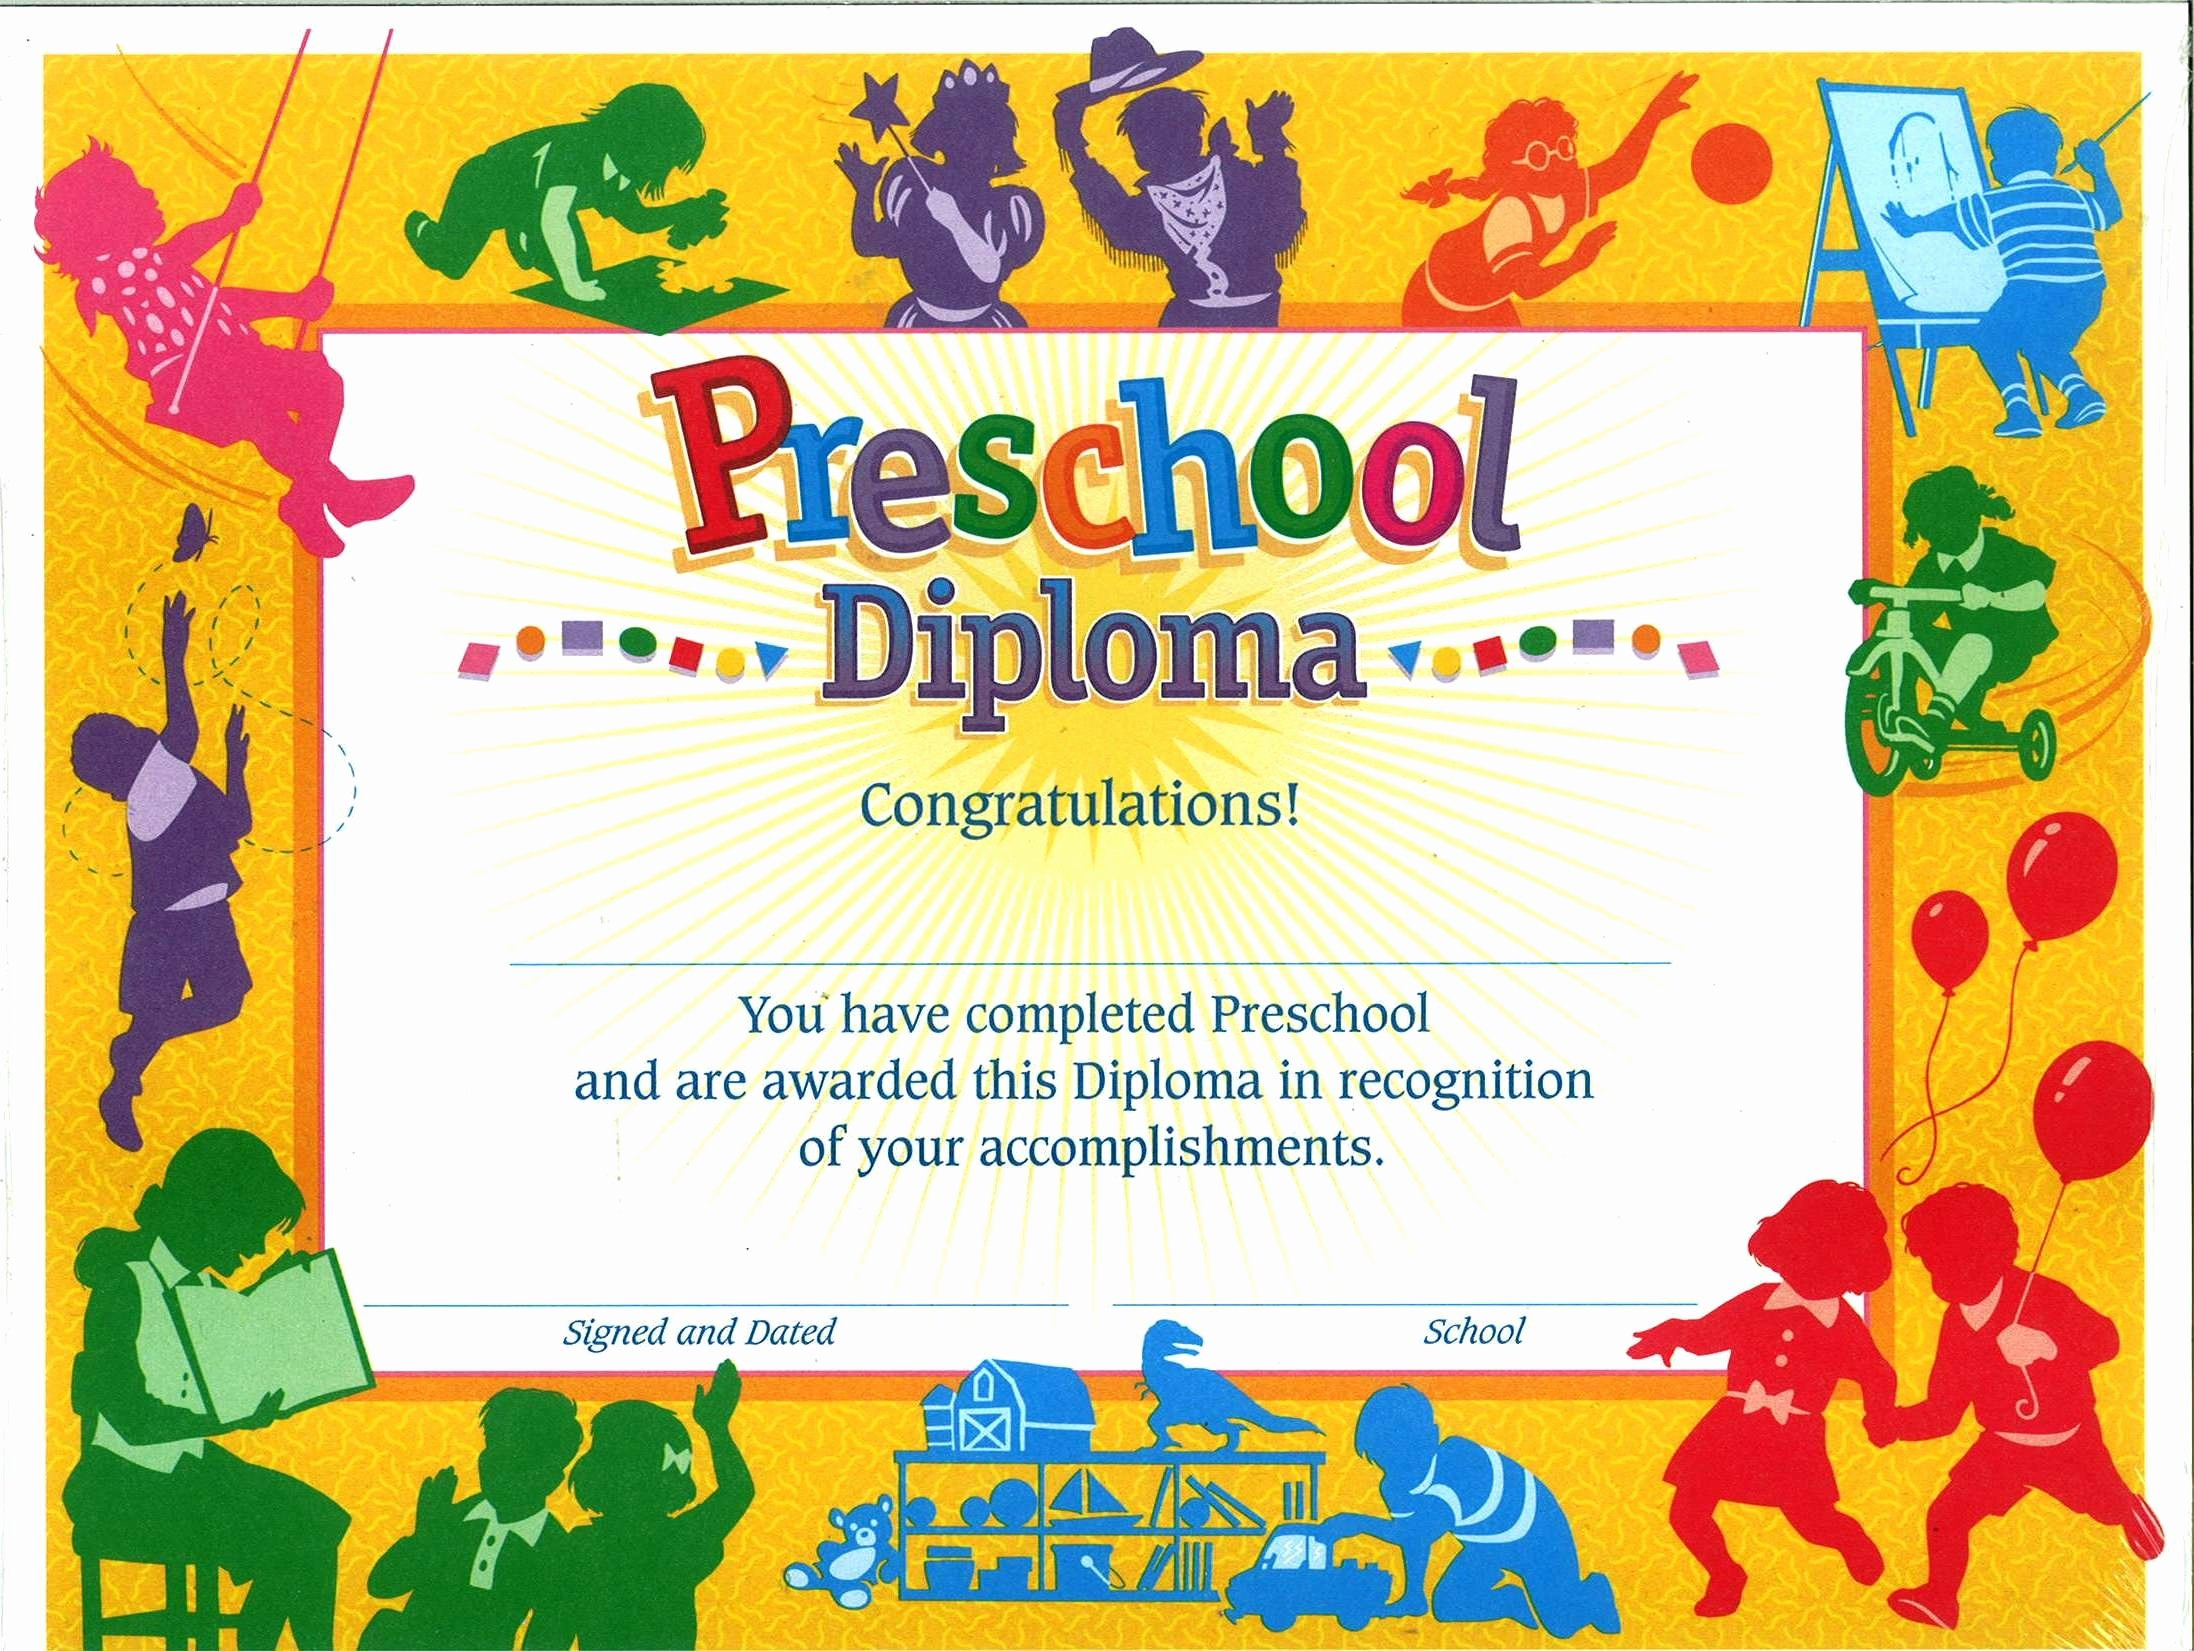 Preschool Graduation Certificate Template Free Inspirational 11 Preschool Certificate Templates Pdf